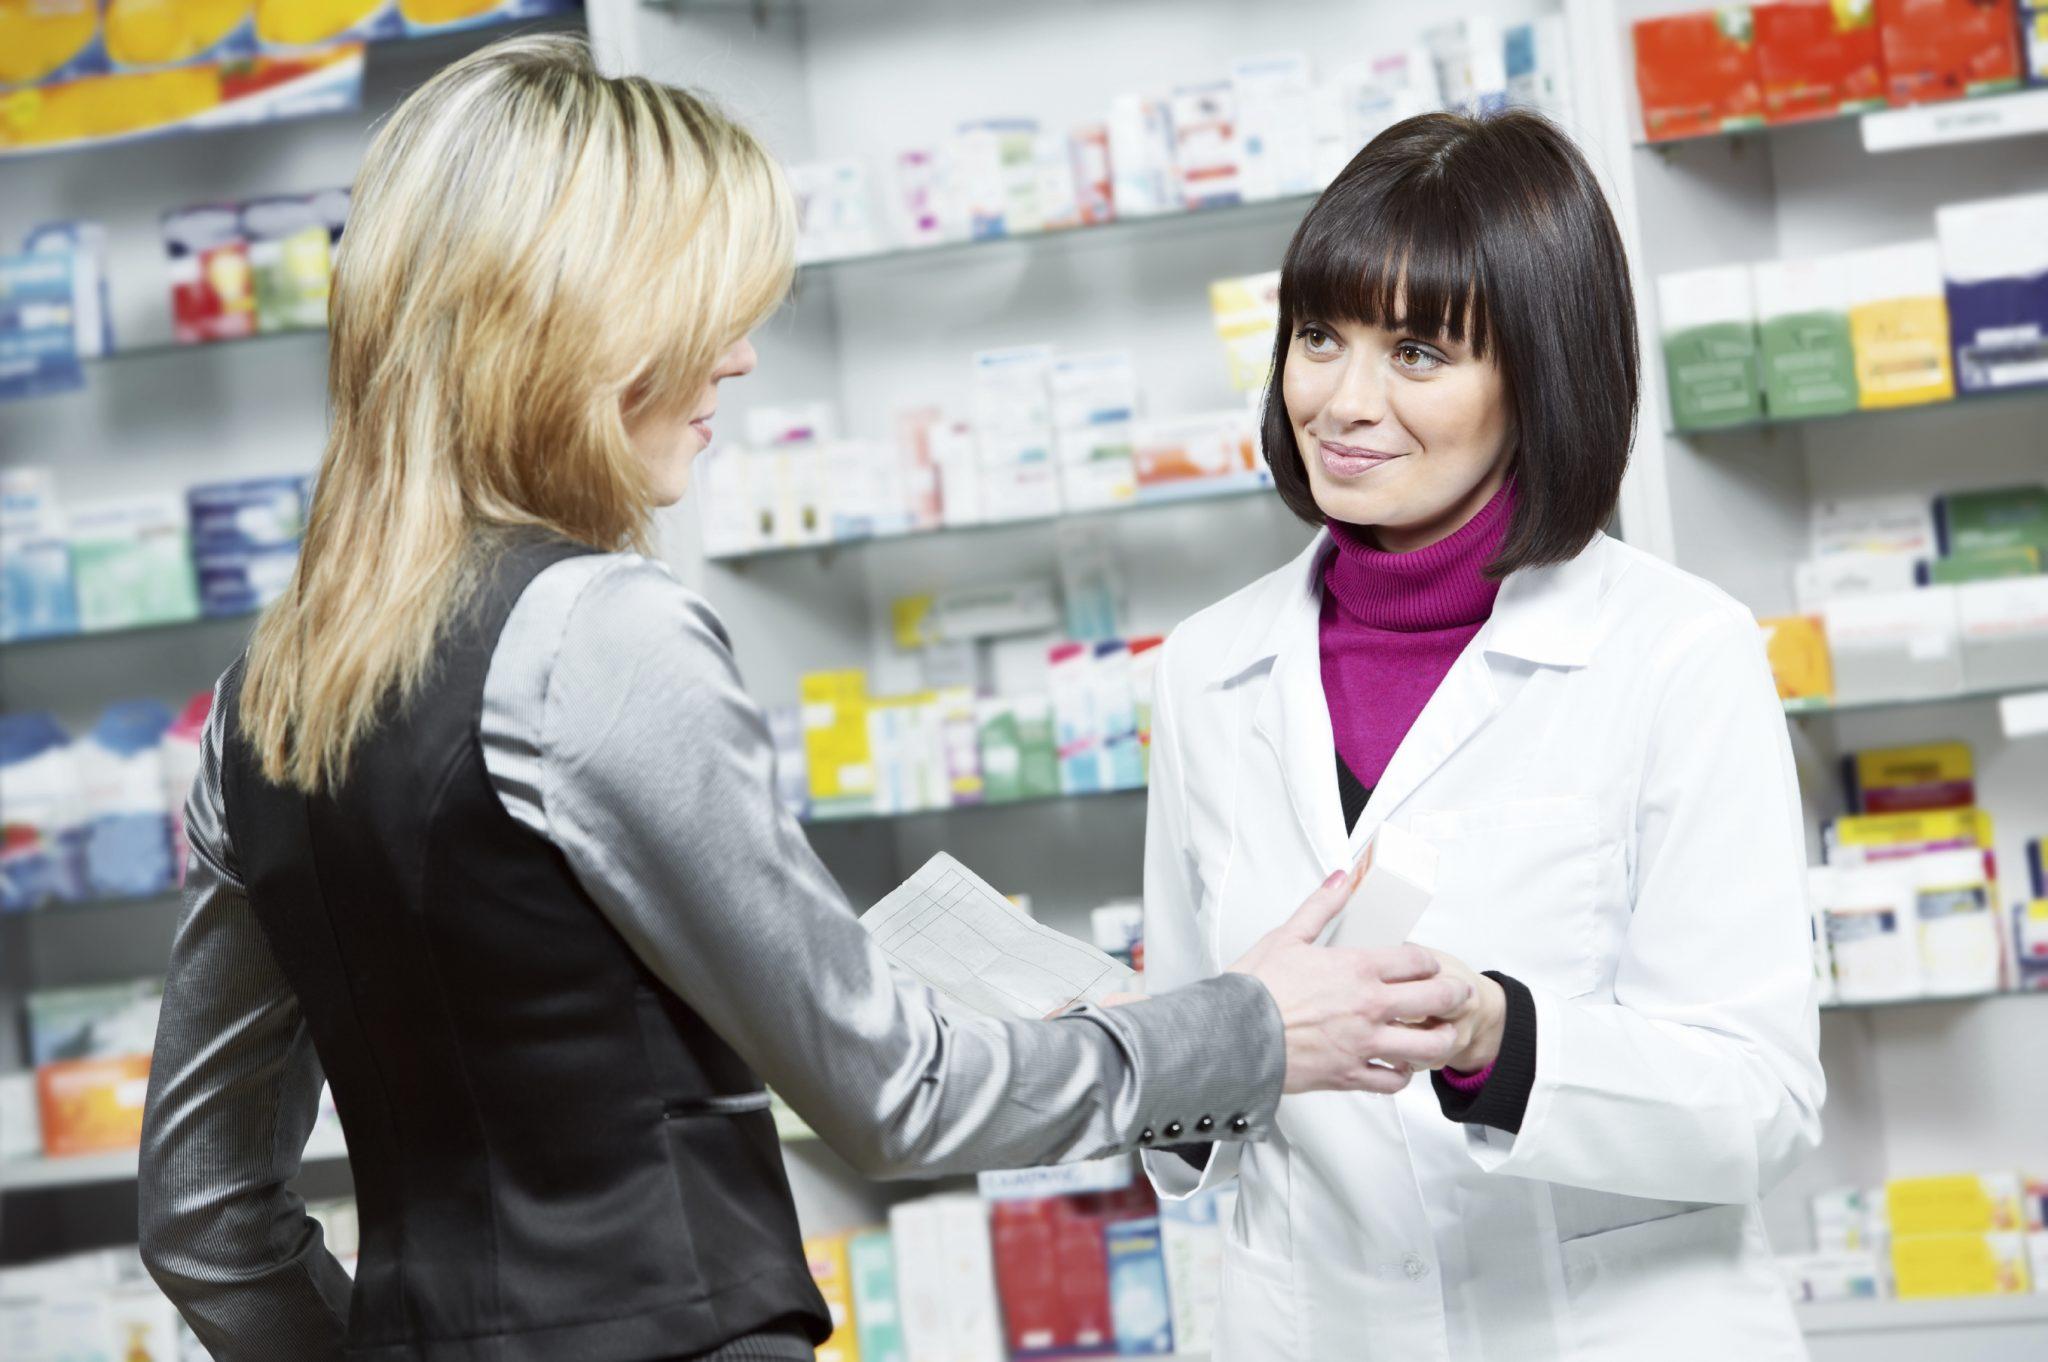 Farmacêutico explicando sobre medicamentos para cliente